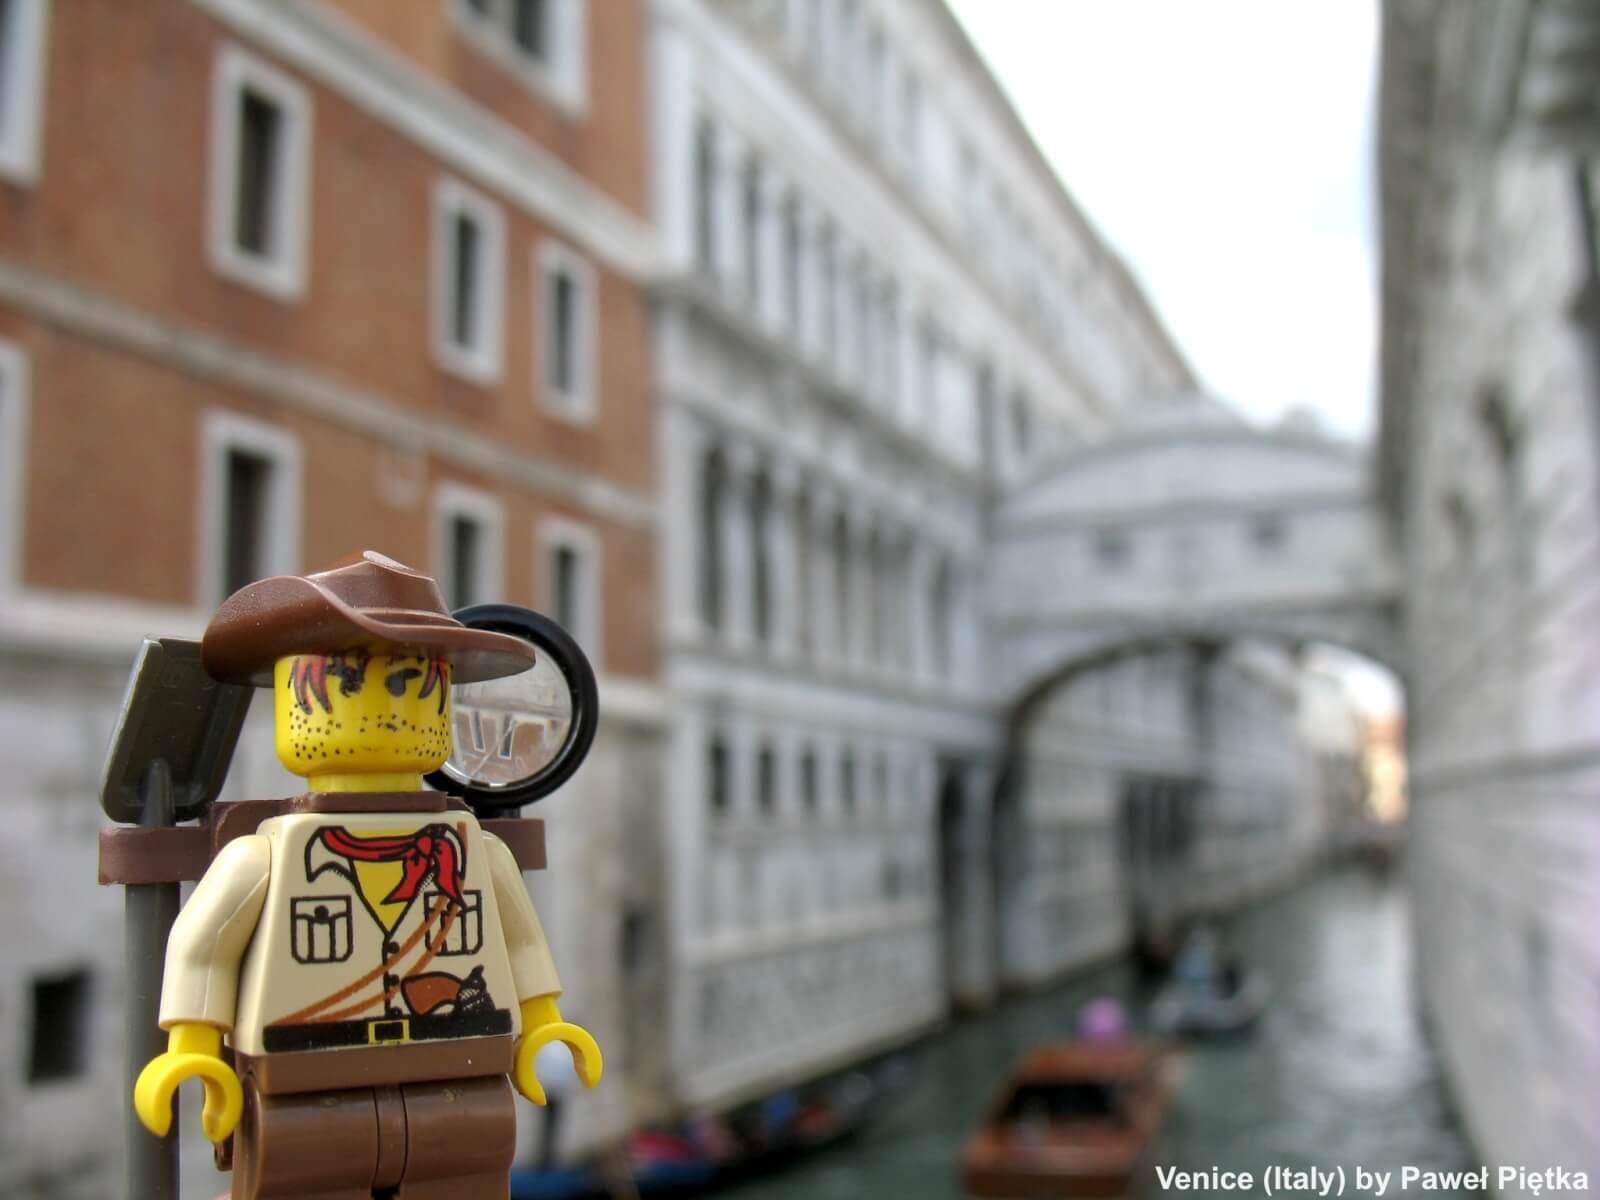 Venice (Italy) - Bridge of Sighs